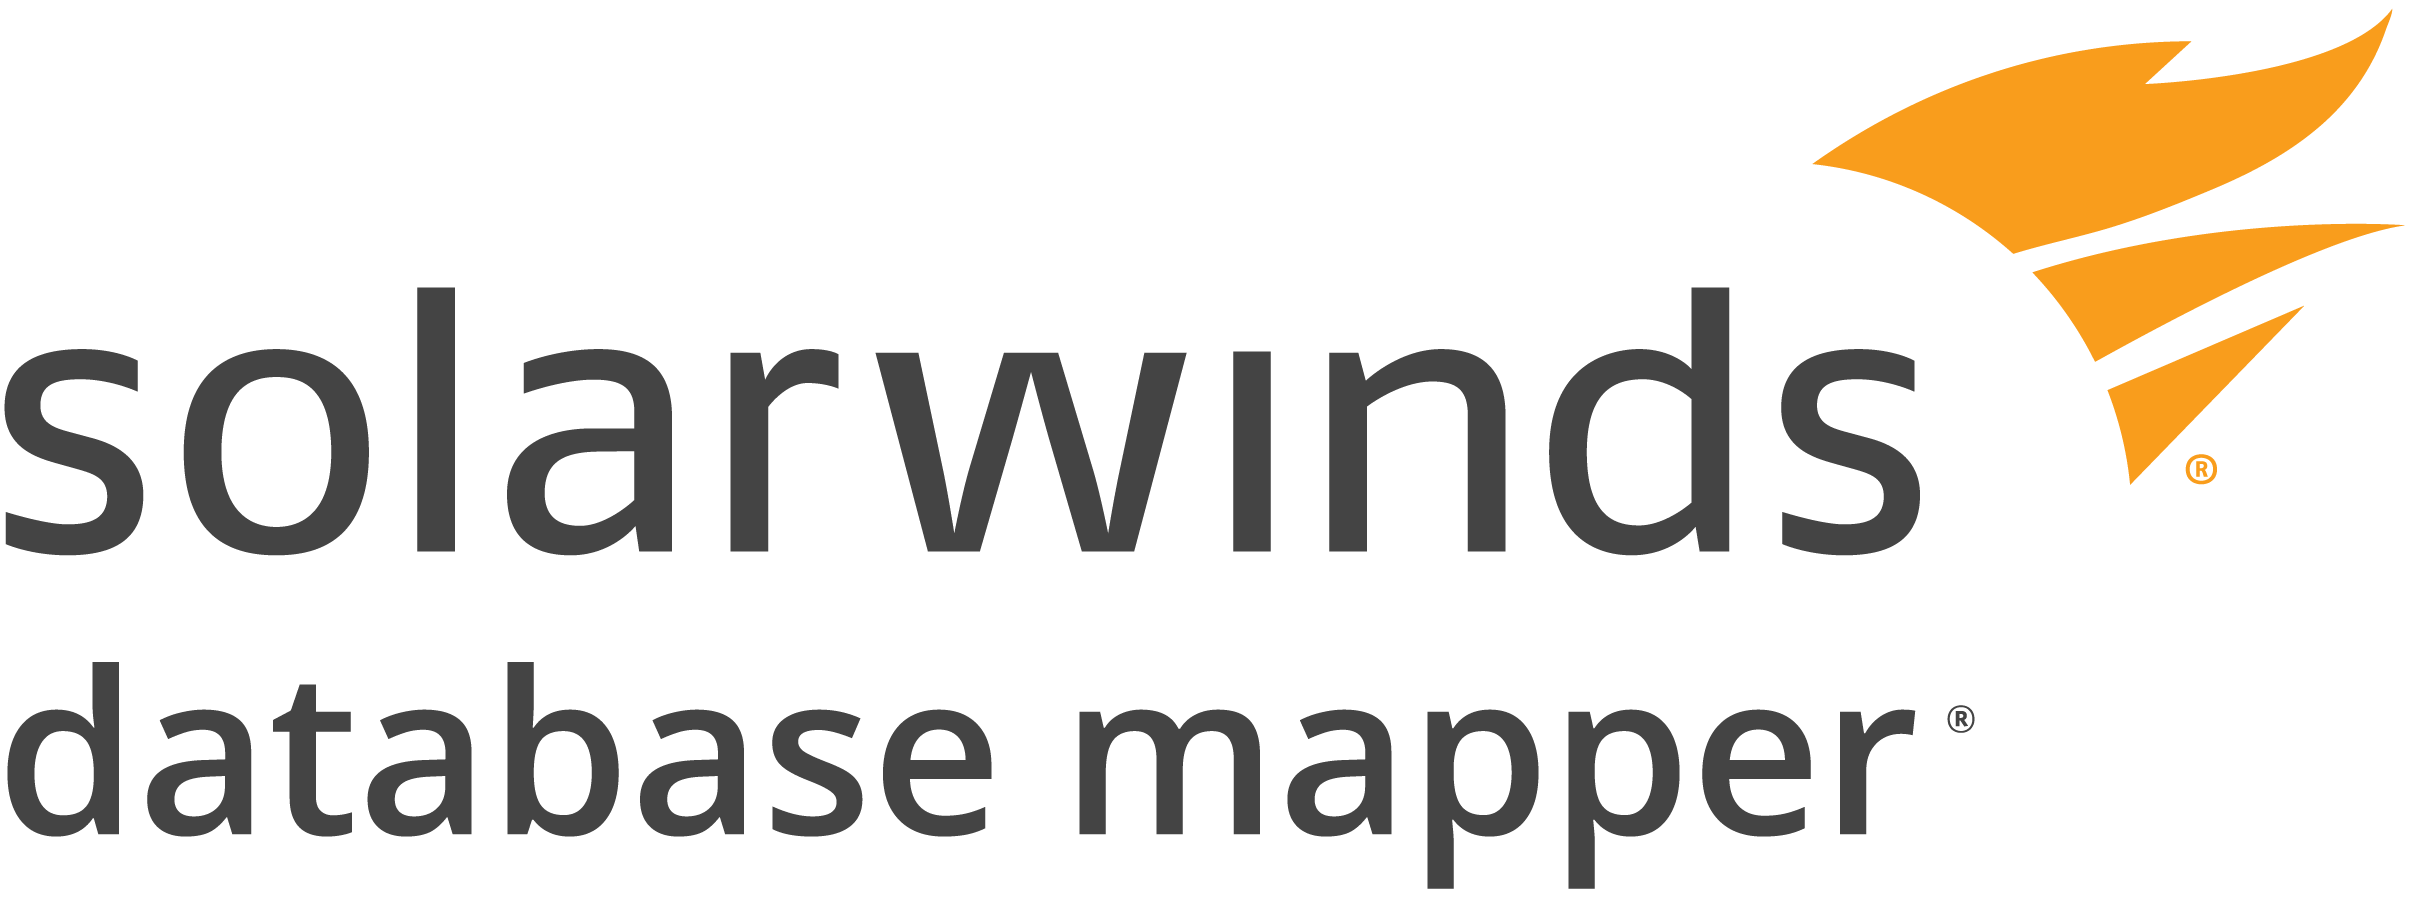 SolarWinds Database Mapper